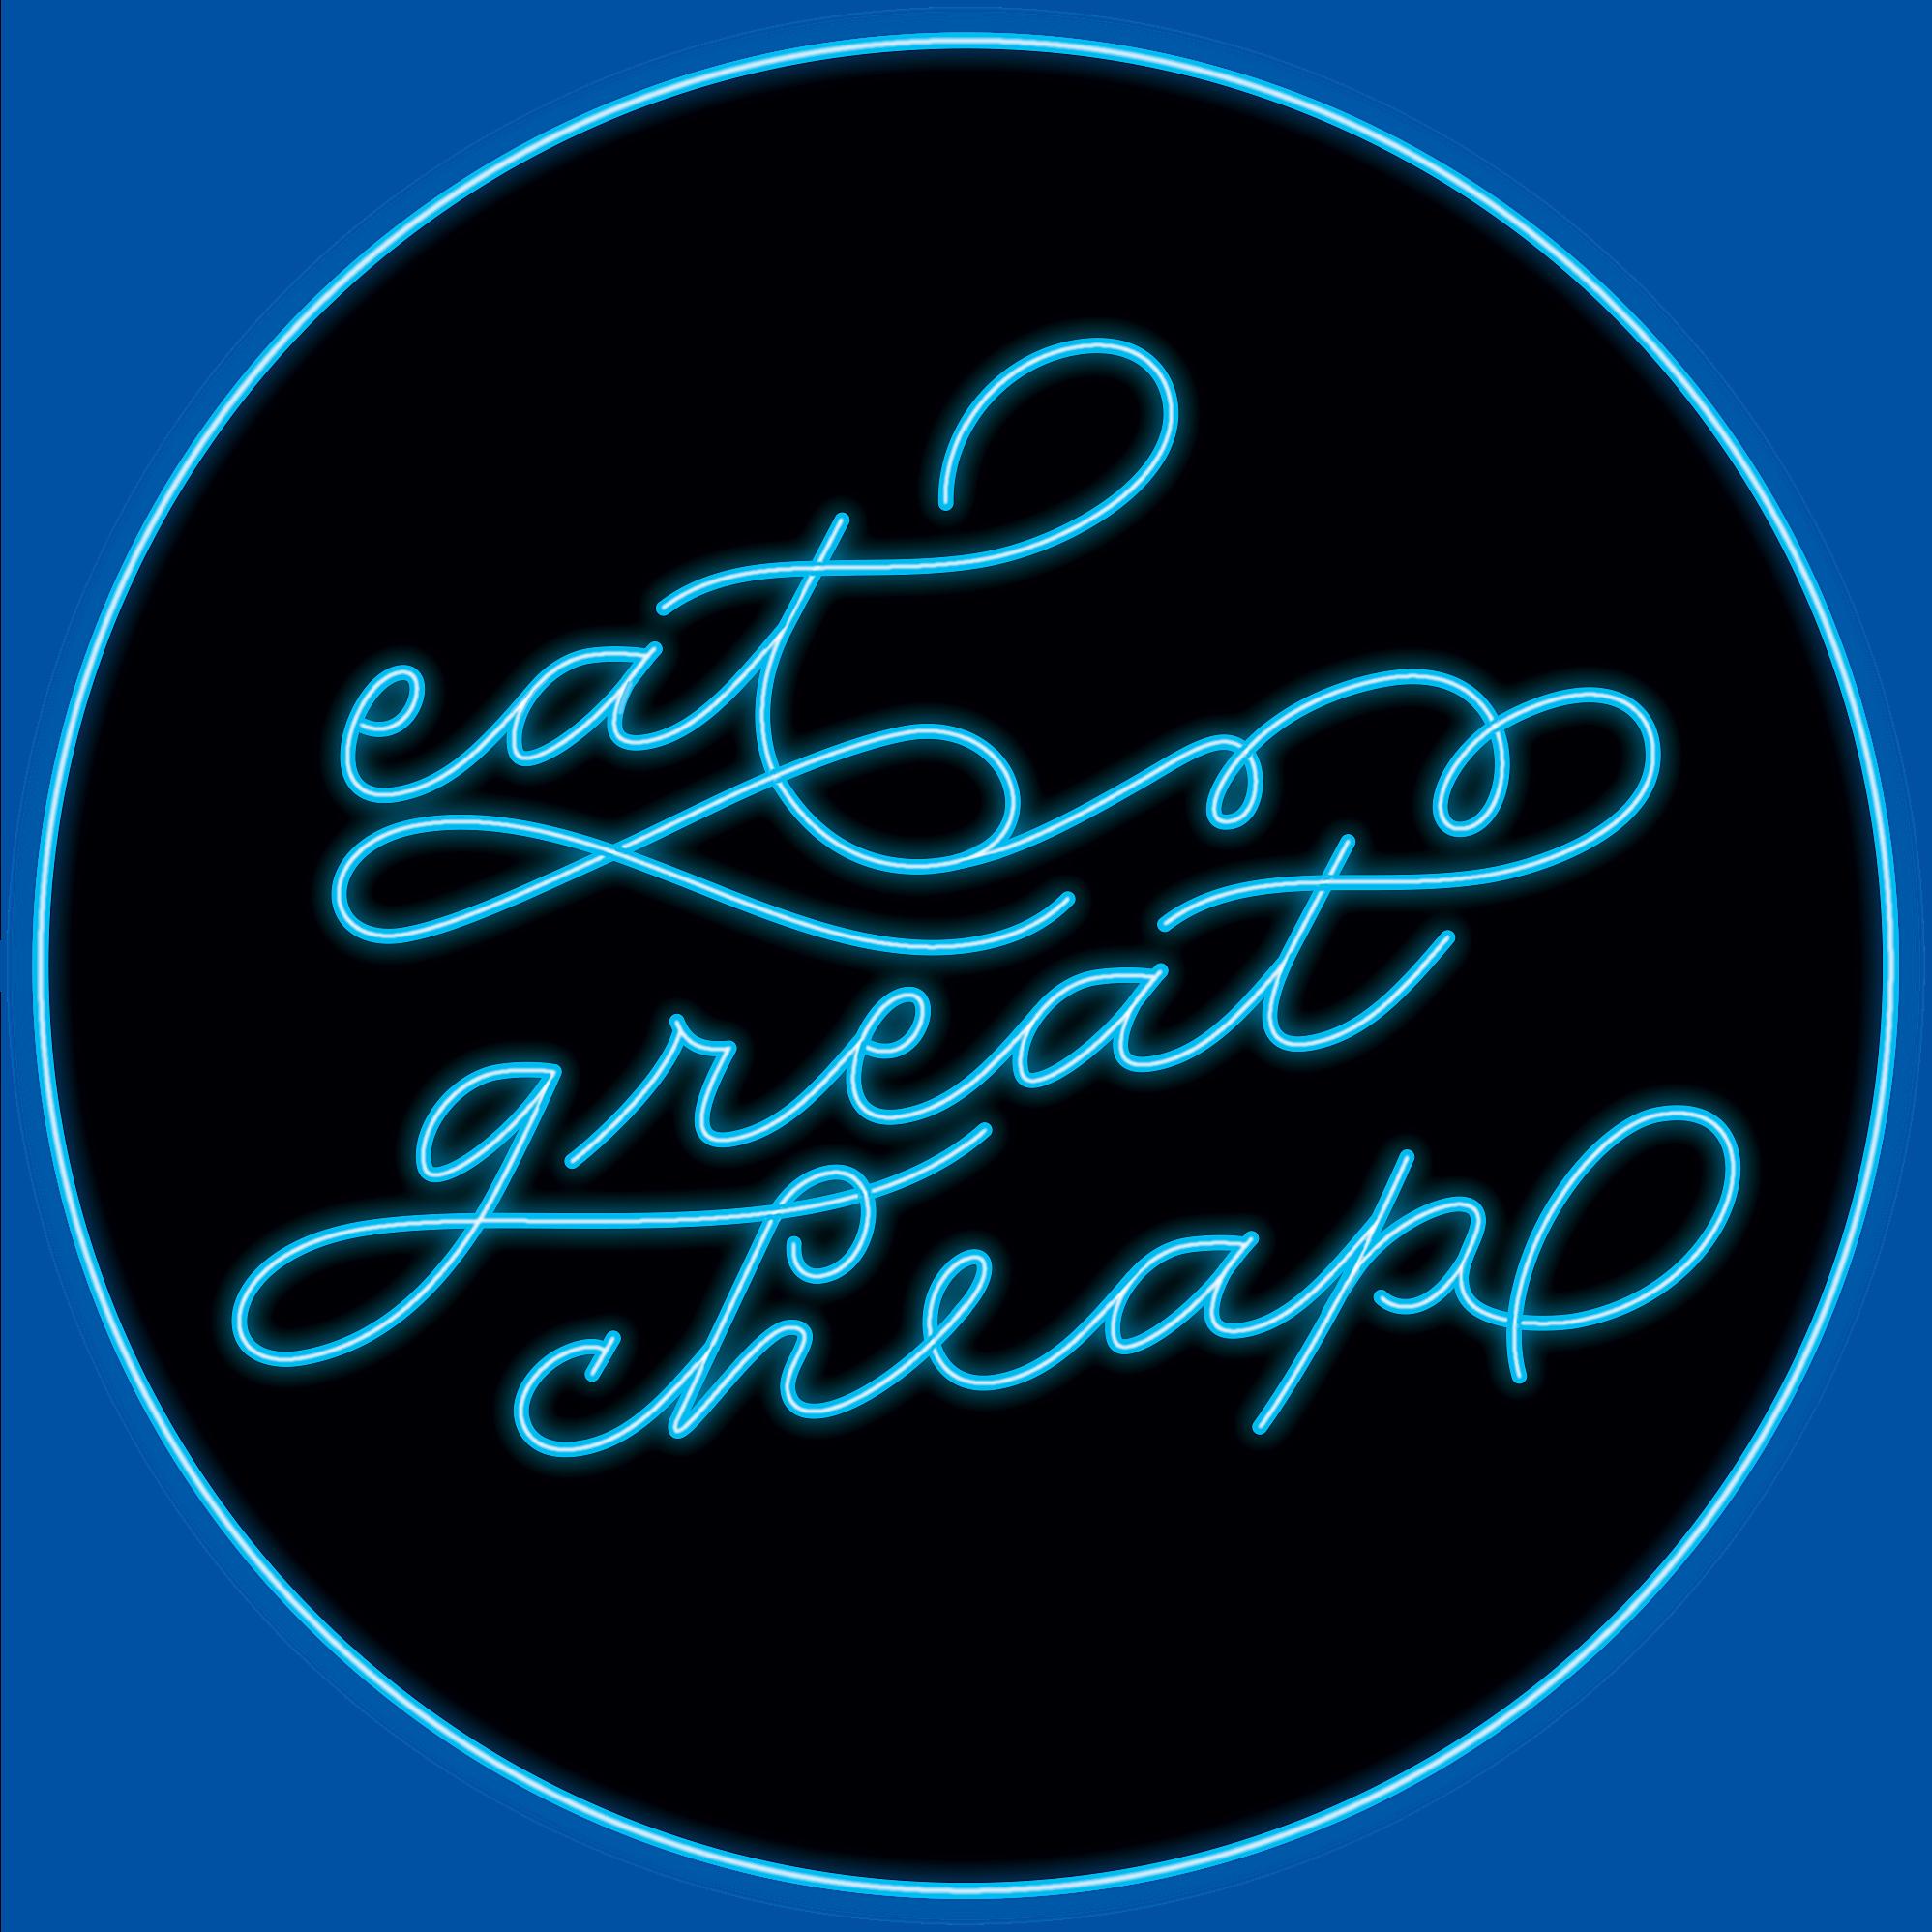 Eat Great Cheap 2019